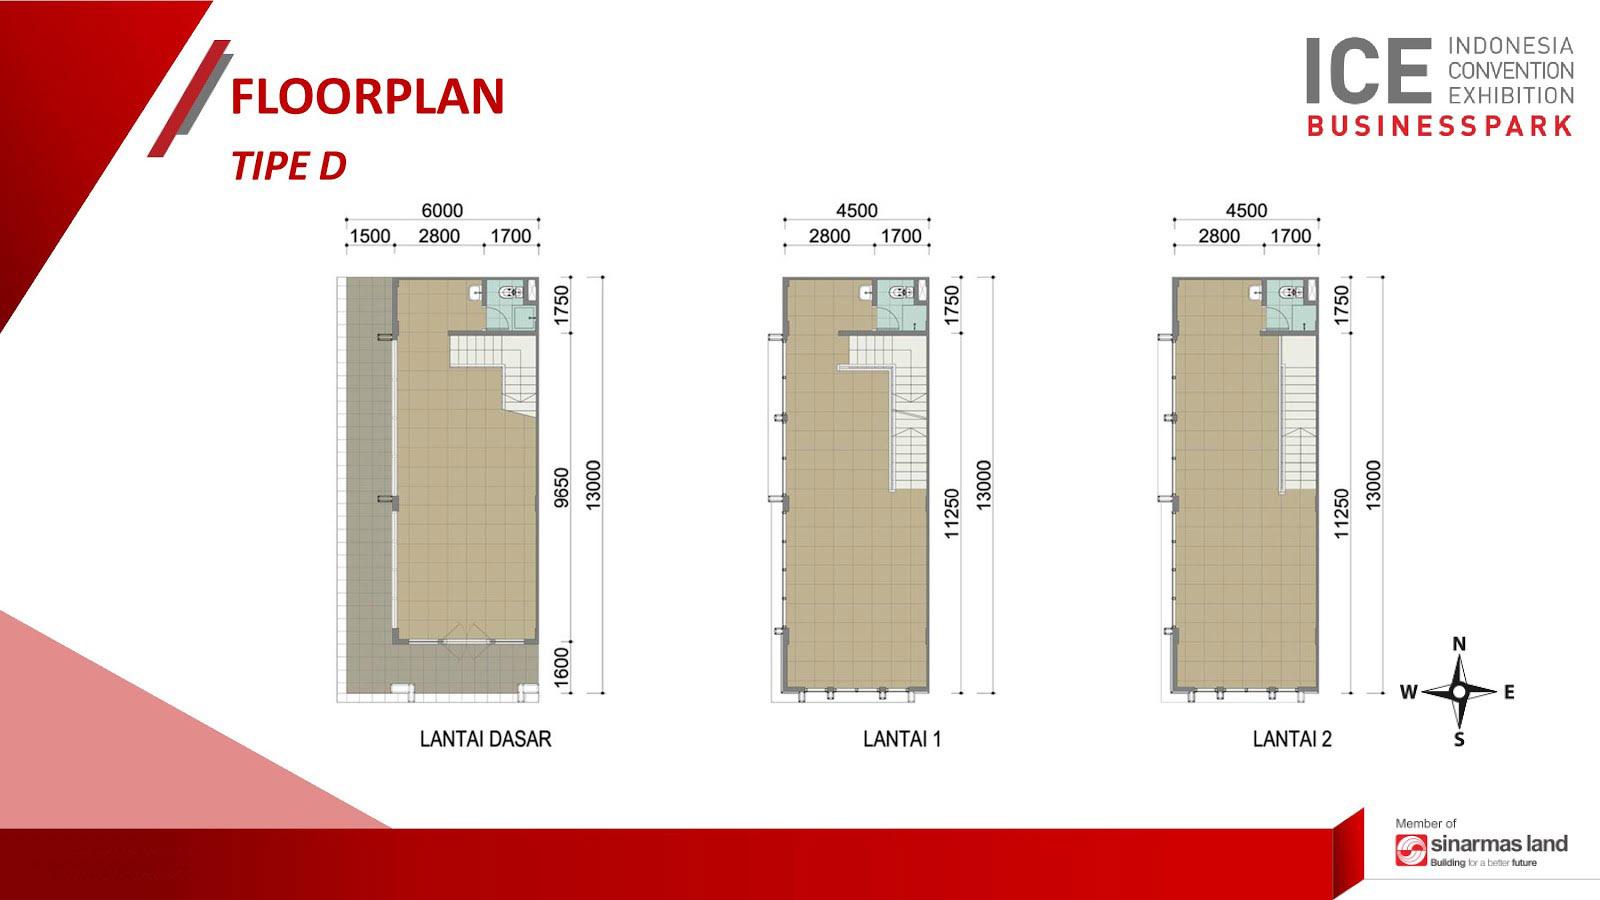 Blokplan Ruko ICE Business Park BSD - Tipe D